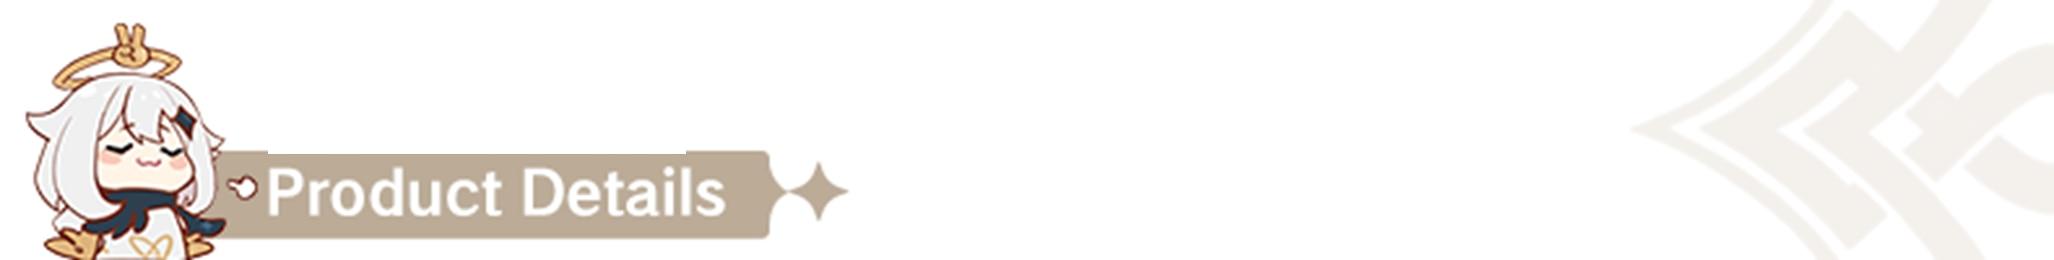 Klee mochila pingente jogo genshin impacto cosplay